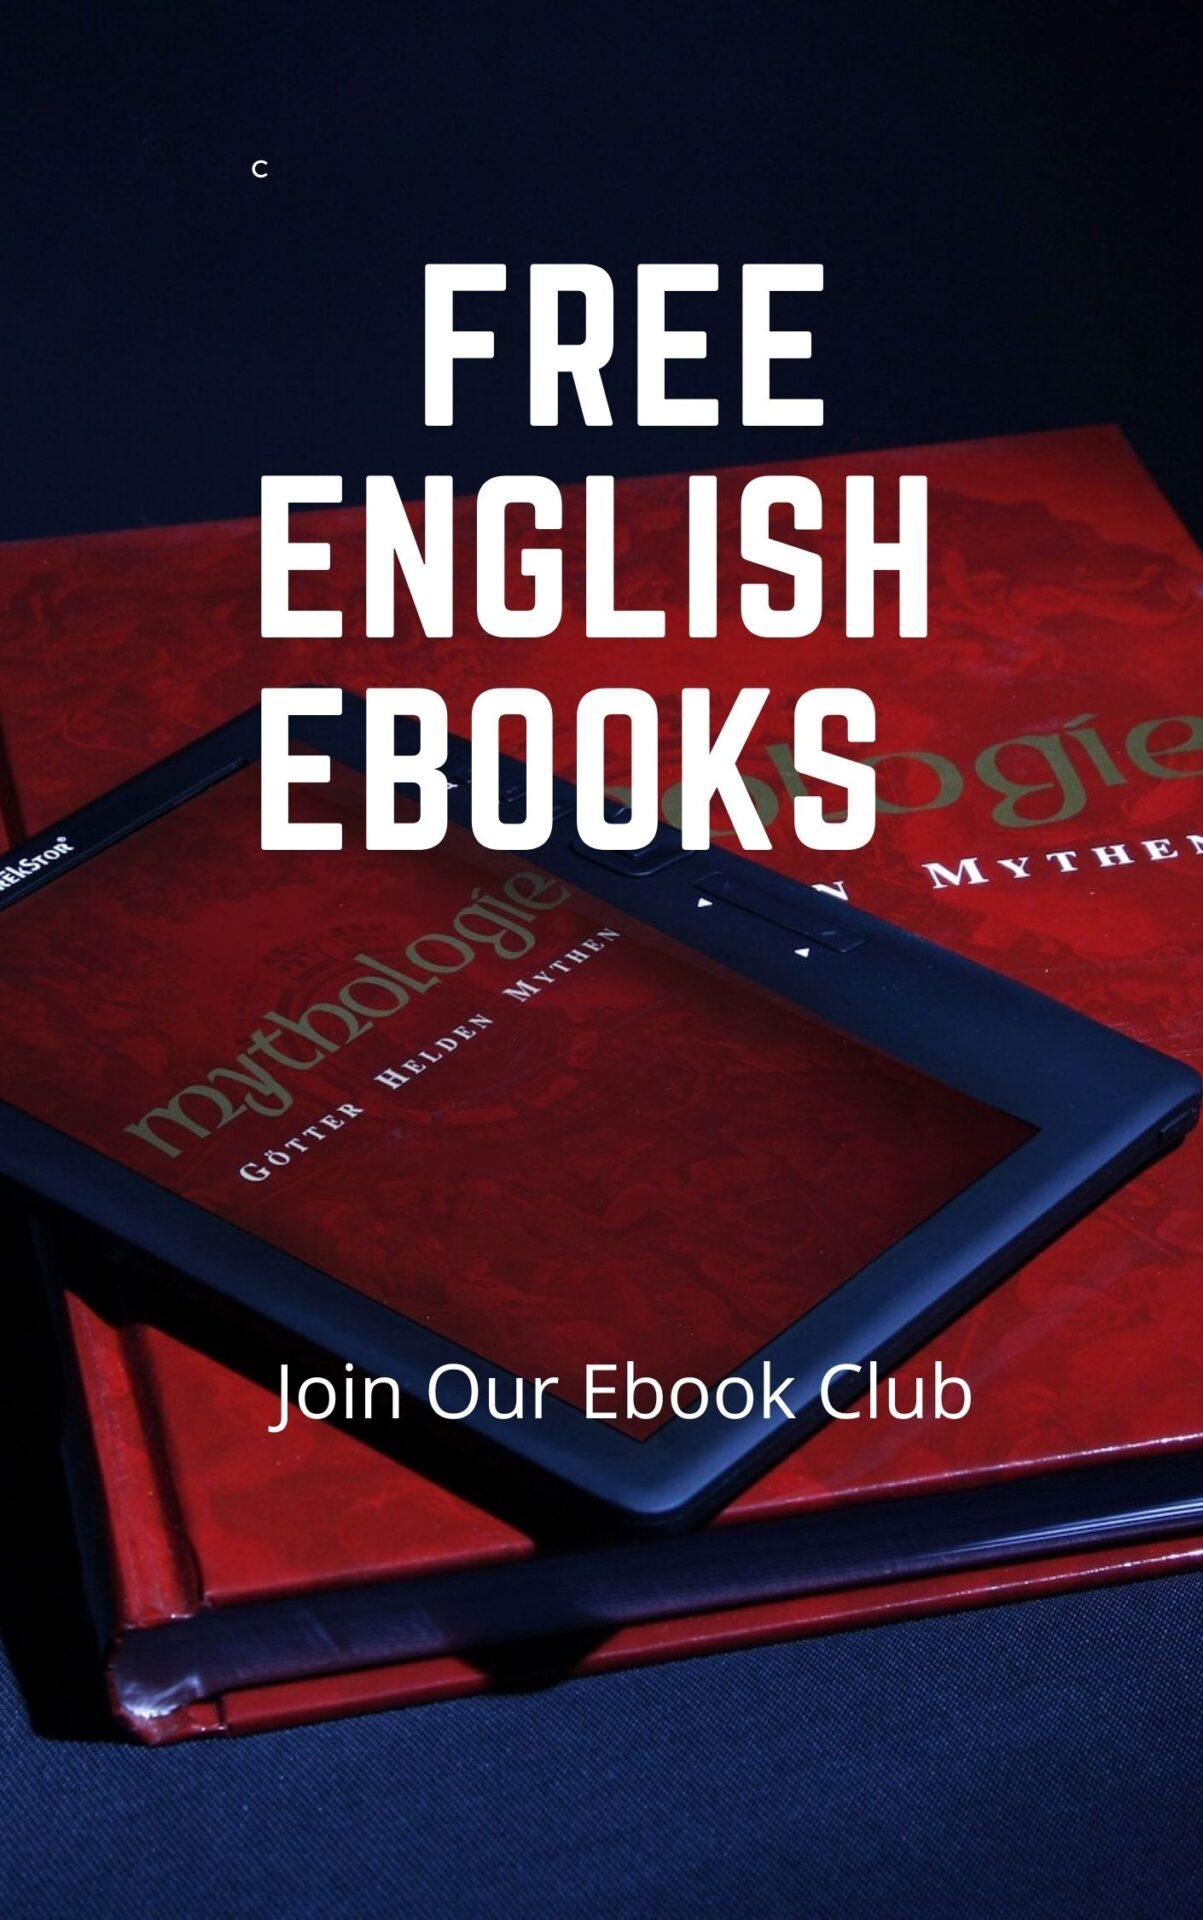 Free english ebooks